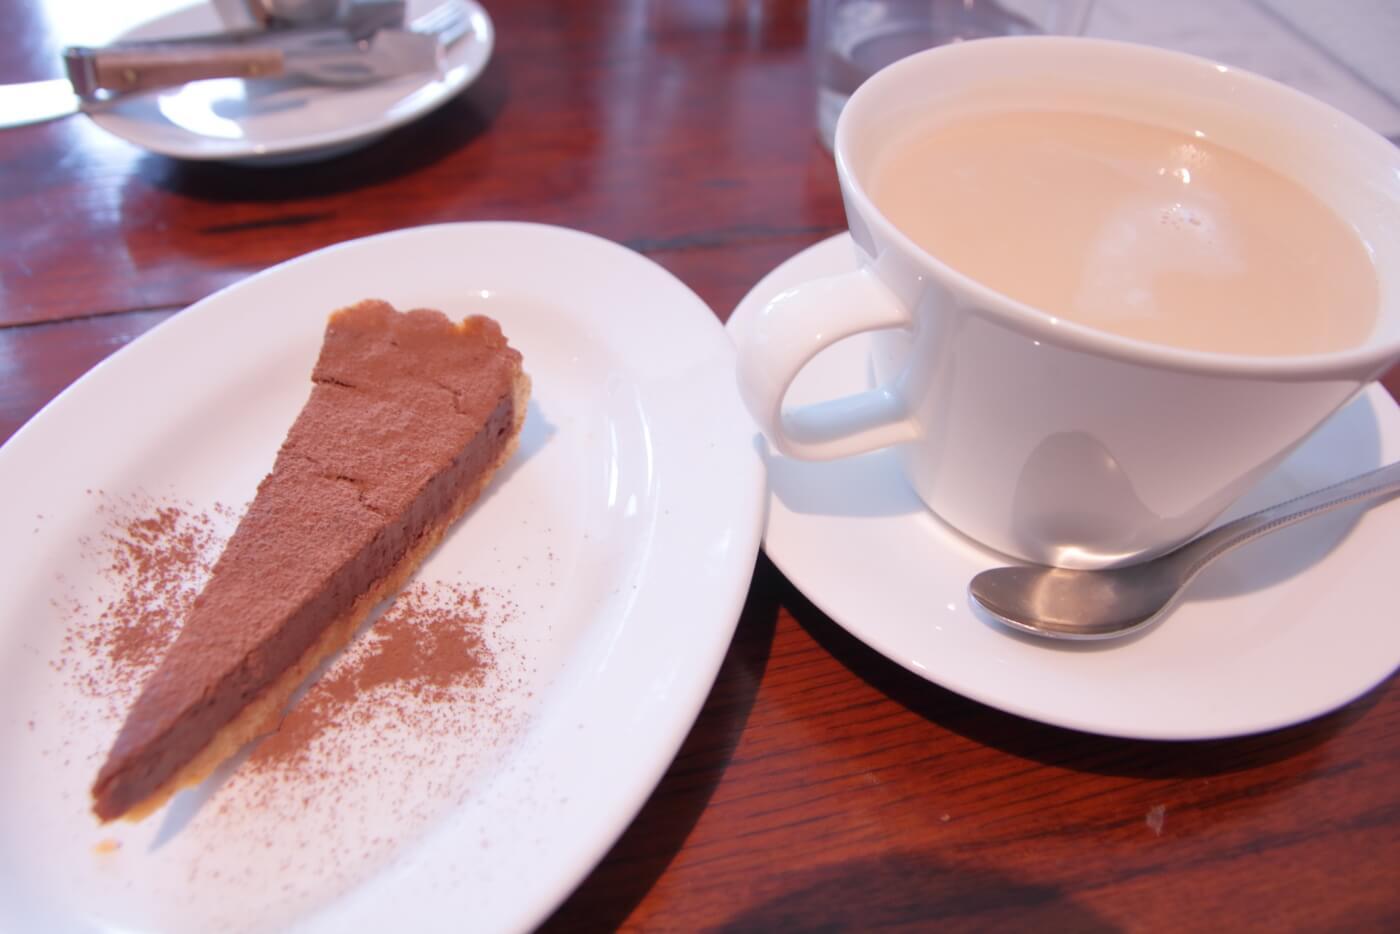 cafe Melba(メルバ)の手作りケーキ チョコレートタルトとカフェオレ